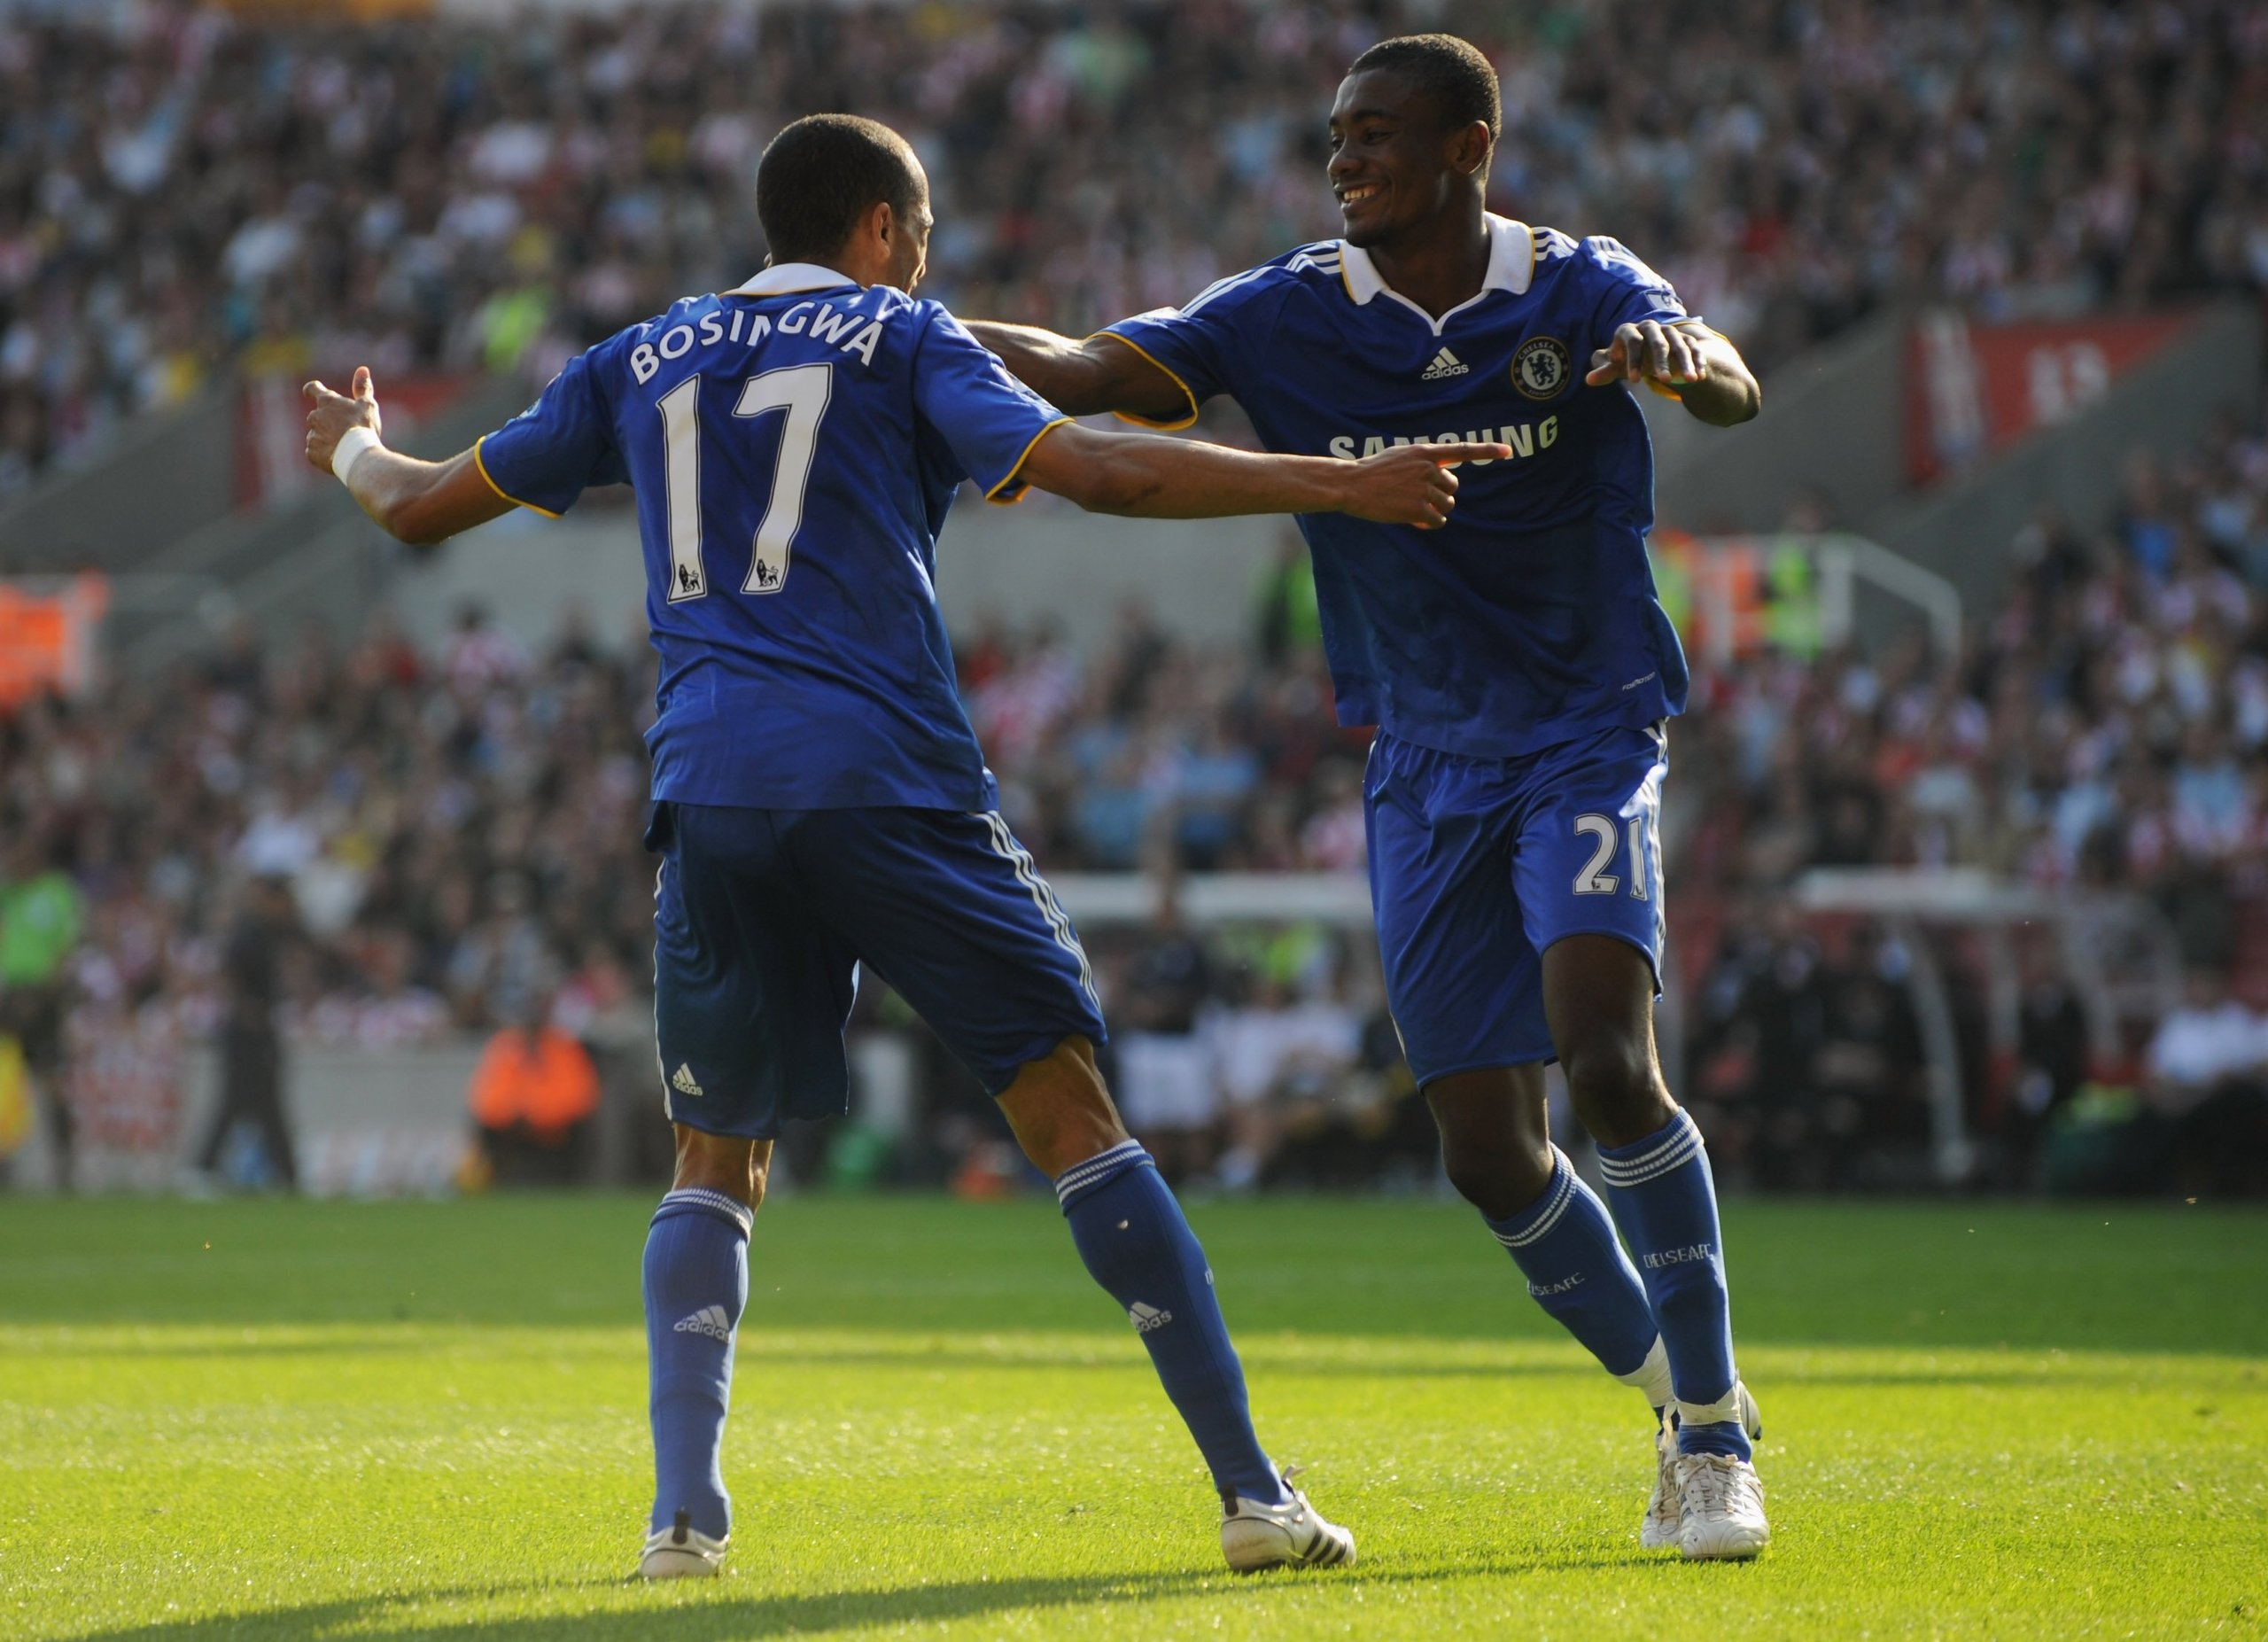 Chelsea Team - Chelsea FC Photo (2506173) - Fanpop